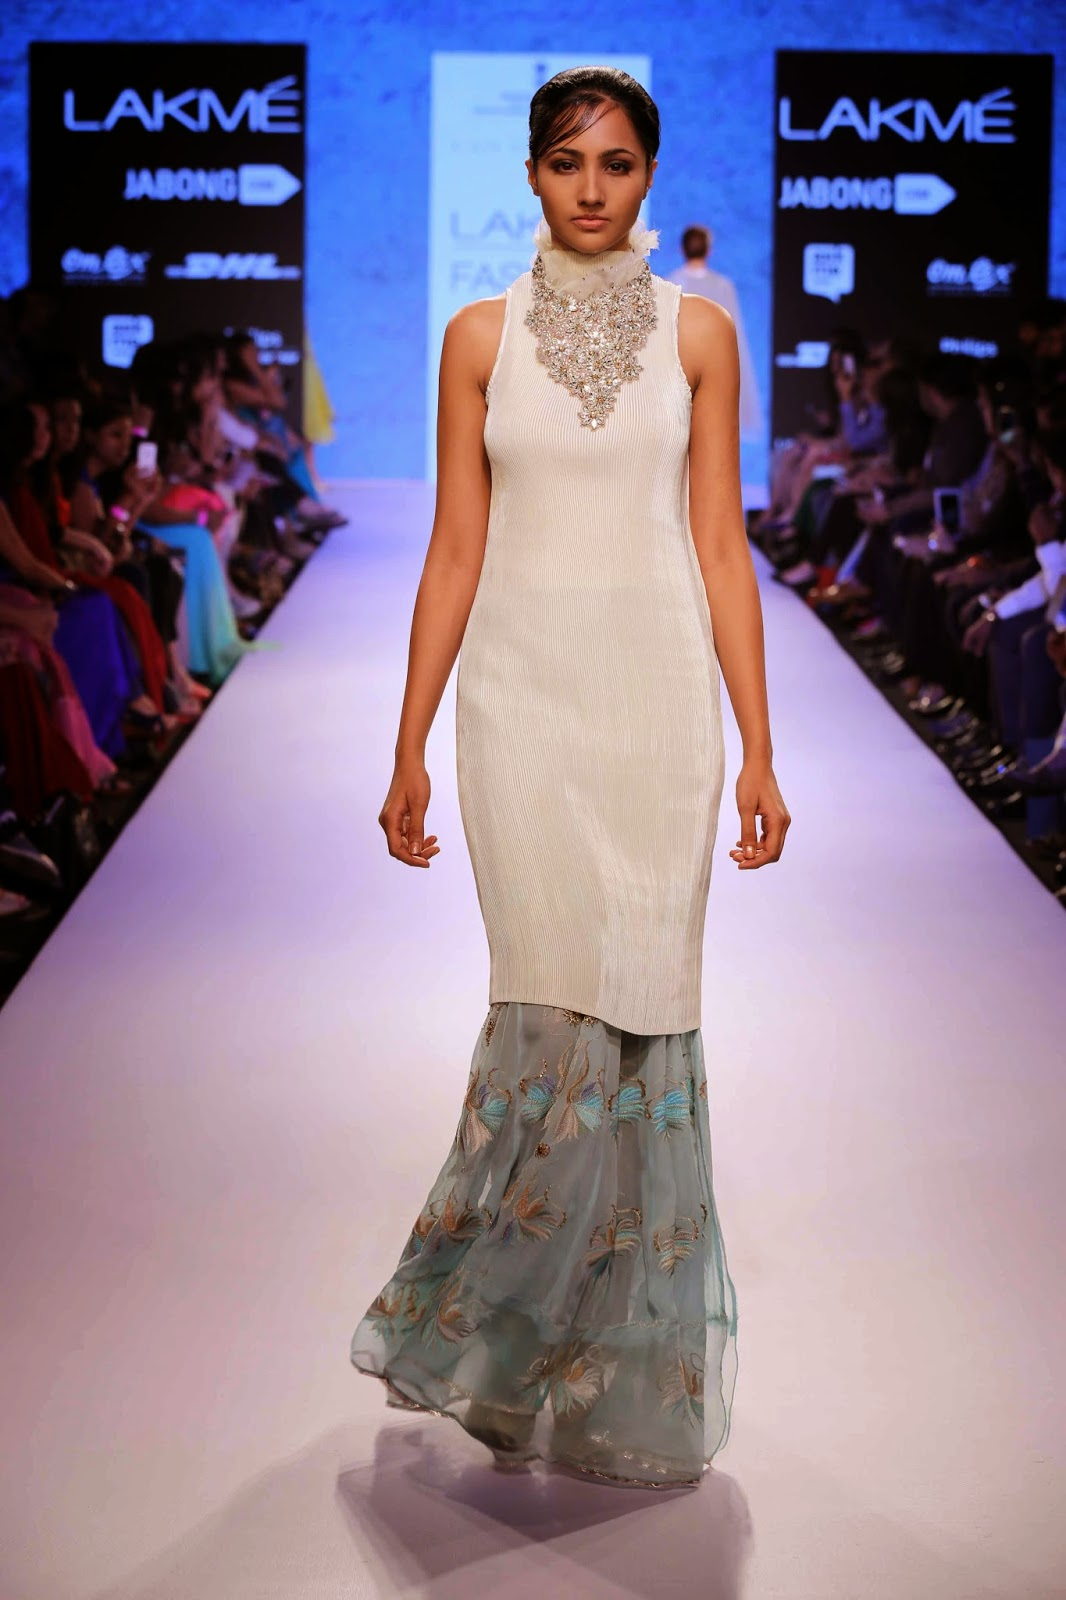 http://aquaintperspective.blogspot.in/, LIFW Day 2, Kiran Uttam Ghosh